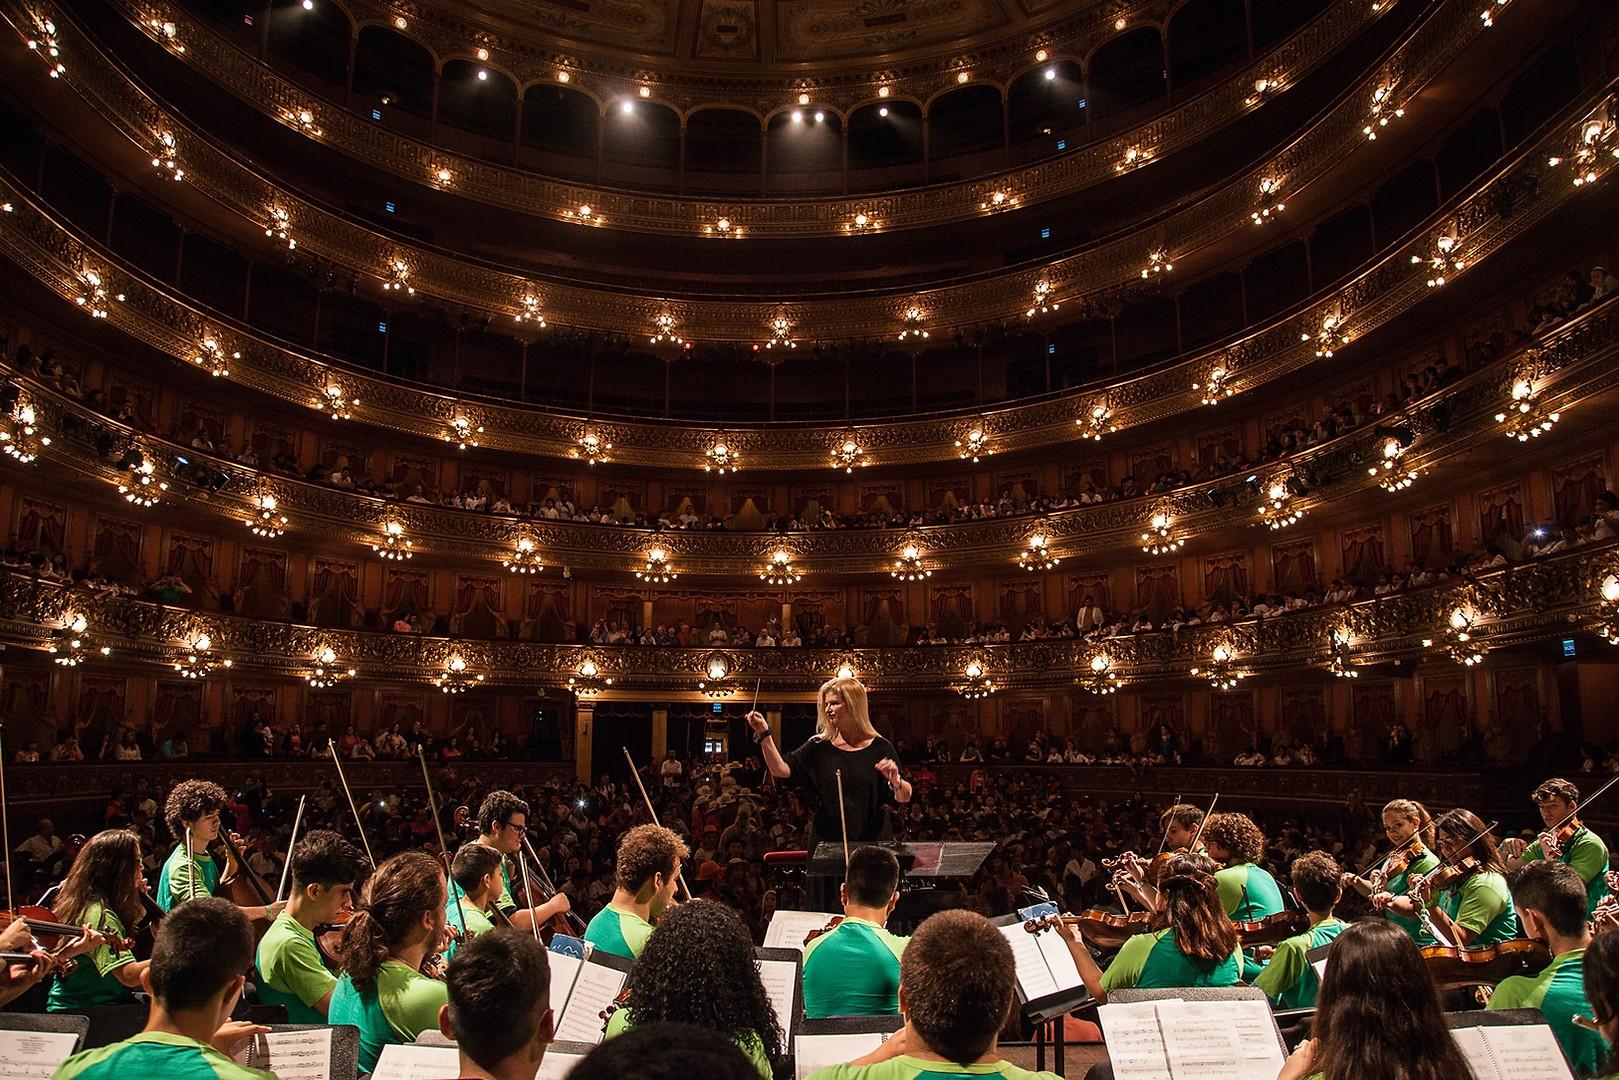 Teatro Colon orquestas juveniles